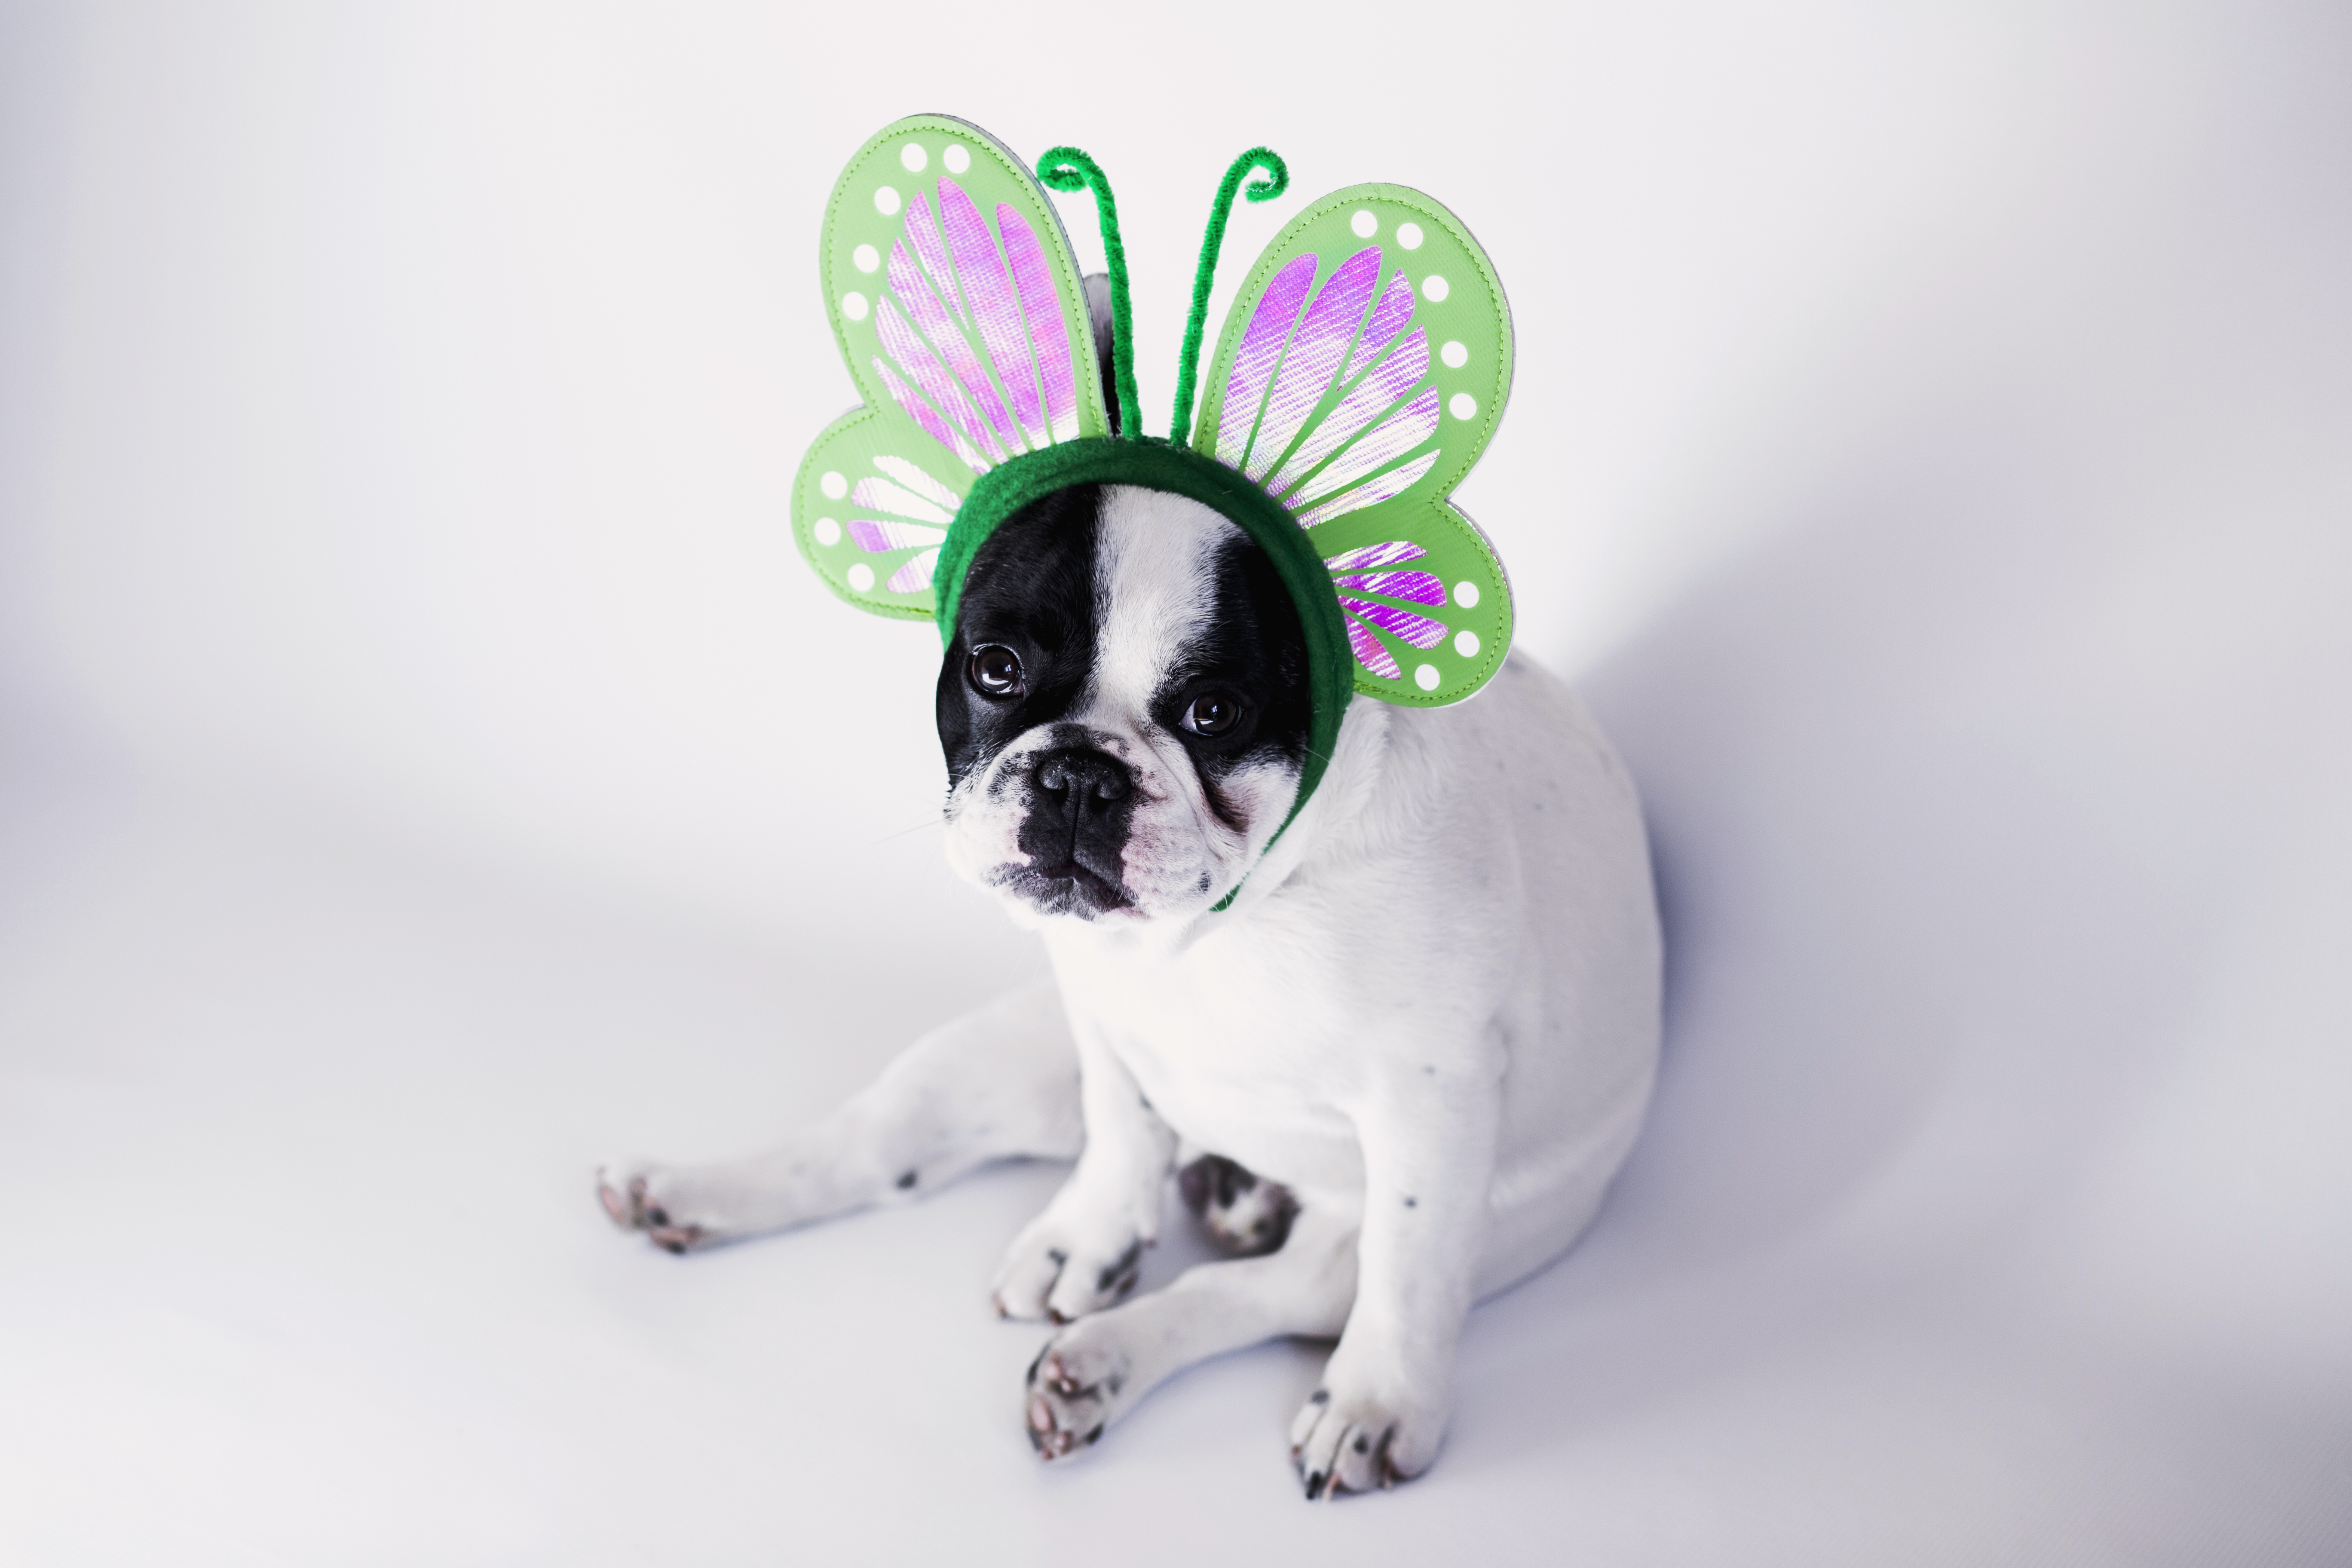 Halloween Events for Children & Pets